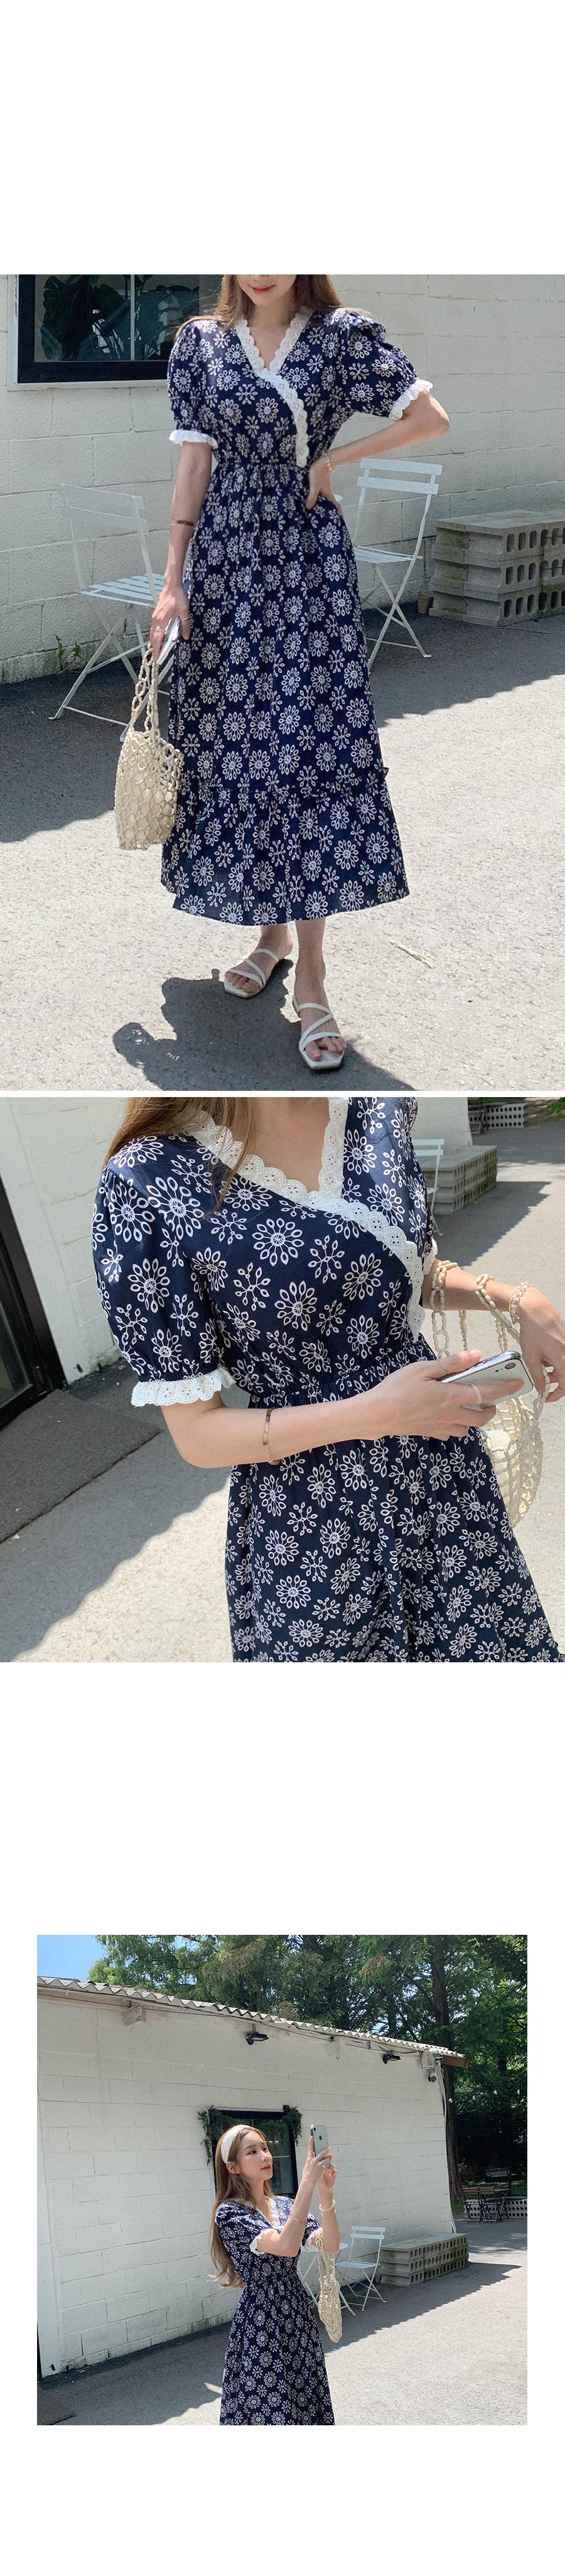 Yugo Girl Lace Flower Dress